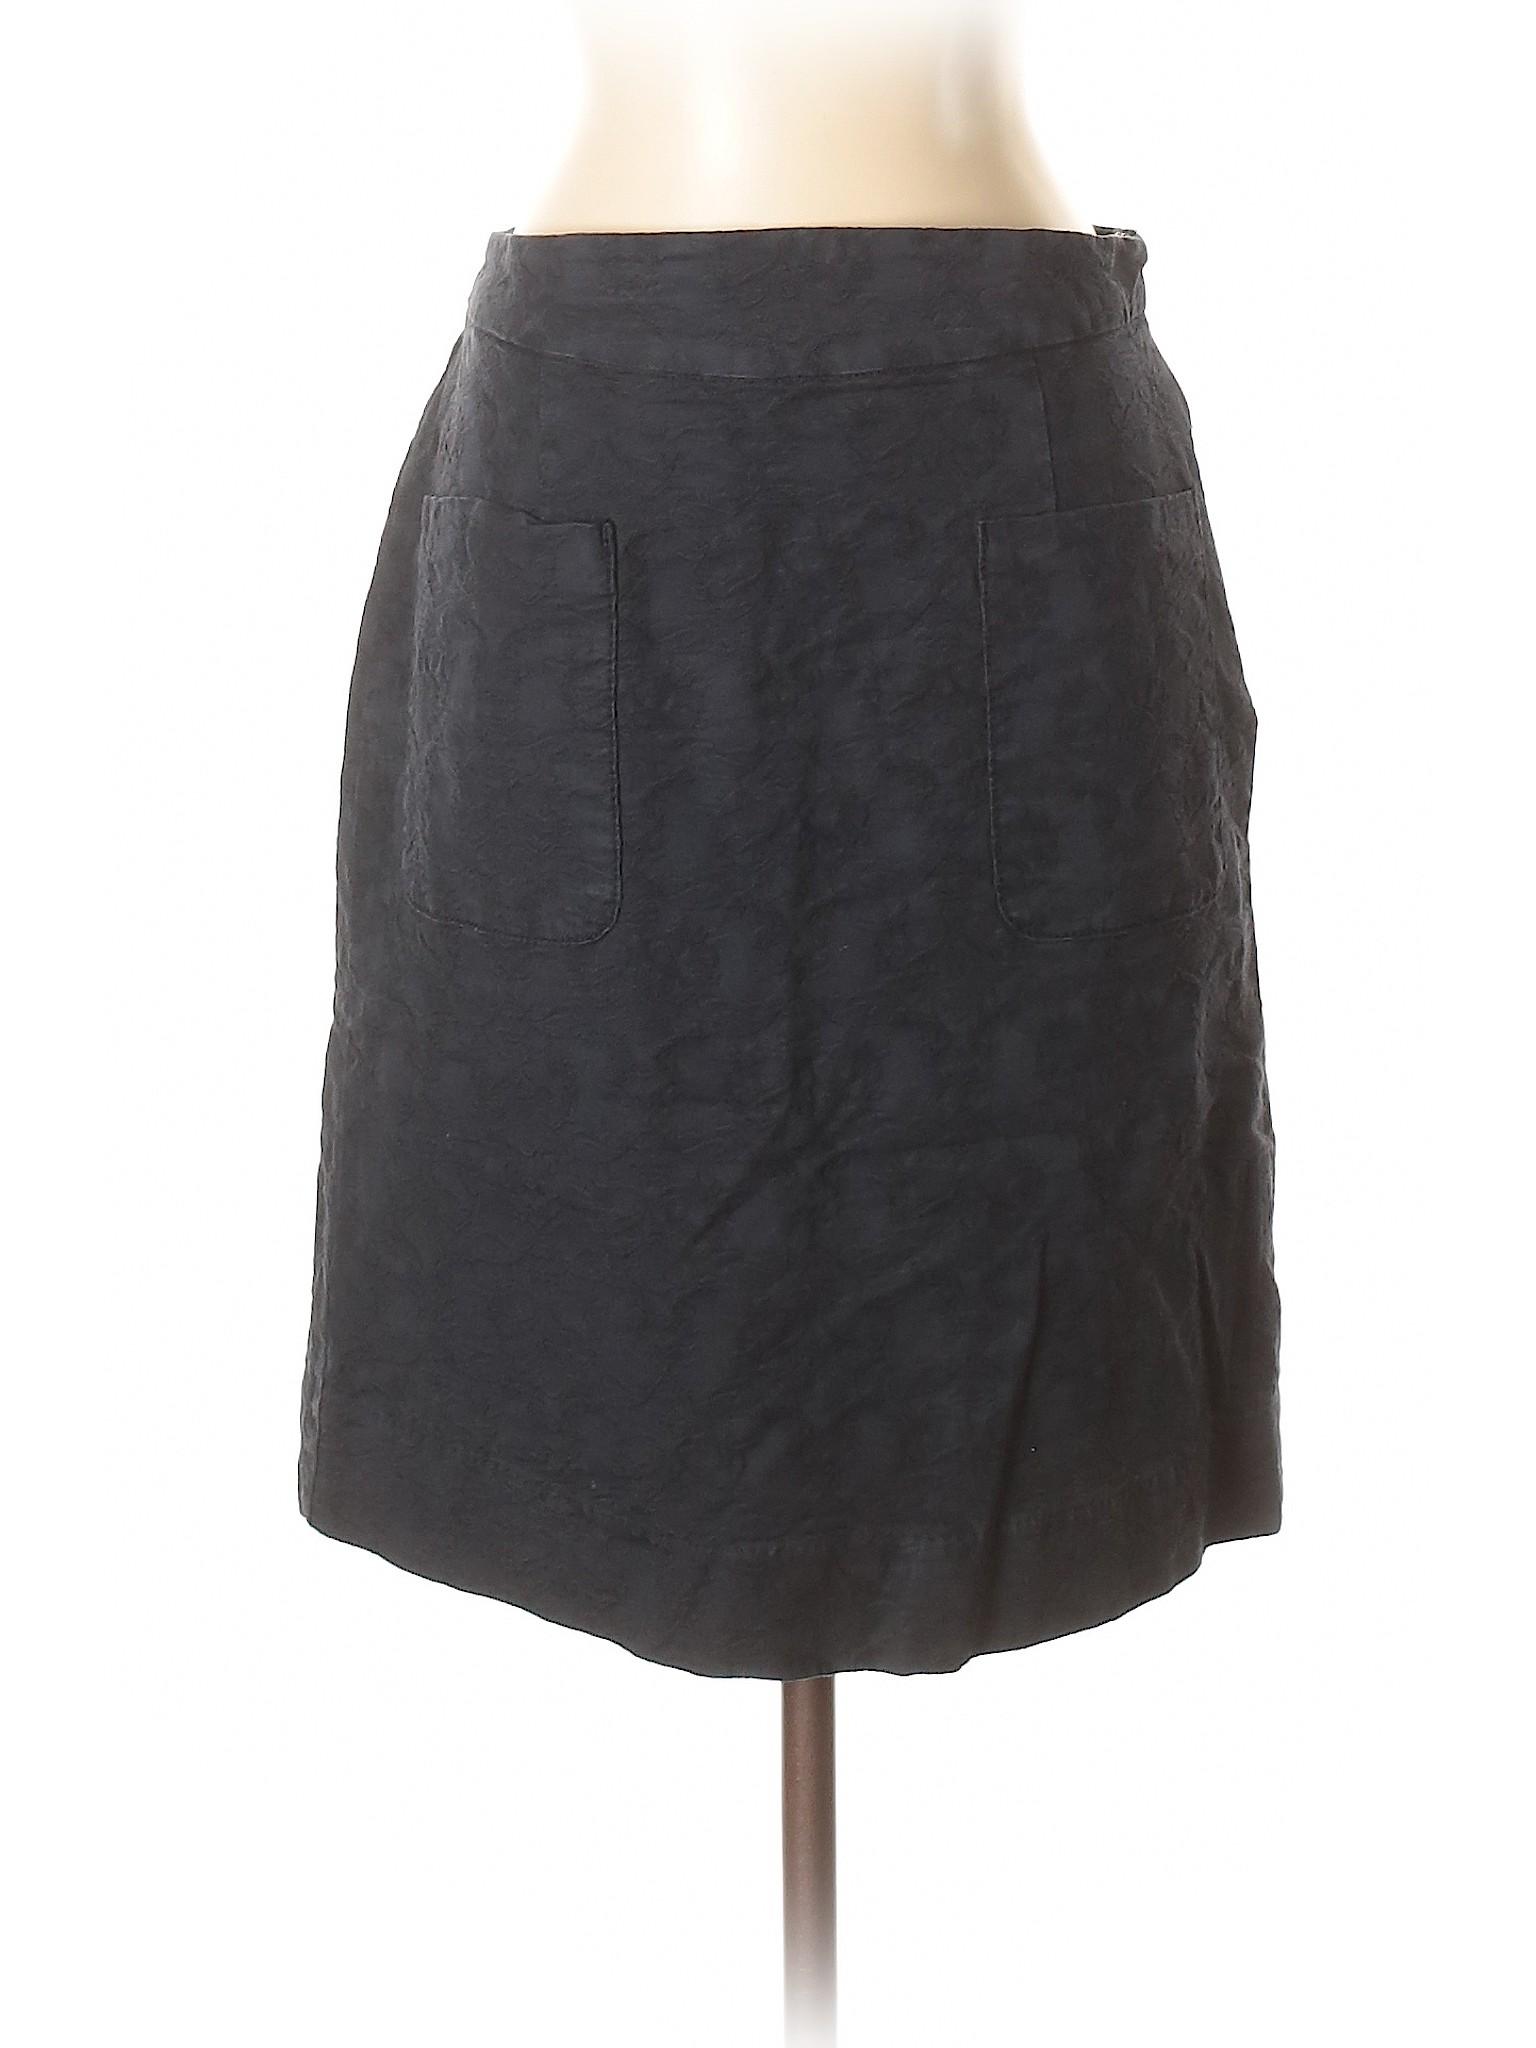 Leisure Soeurs Moulinette Winter Skirt Casual rp0rqzw